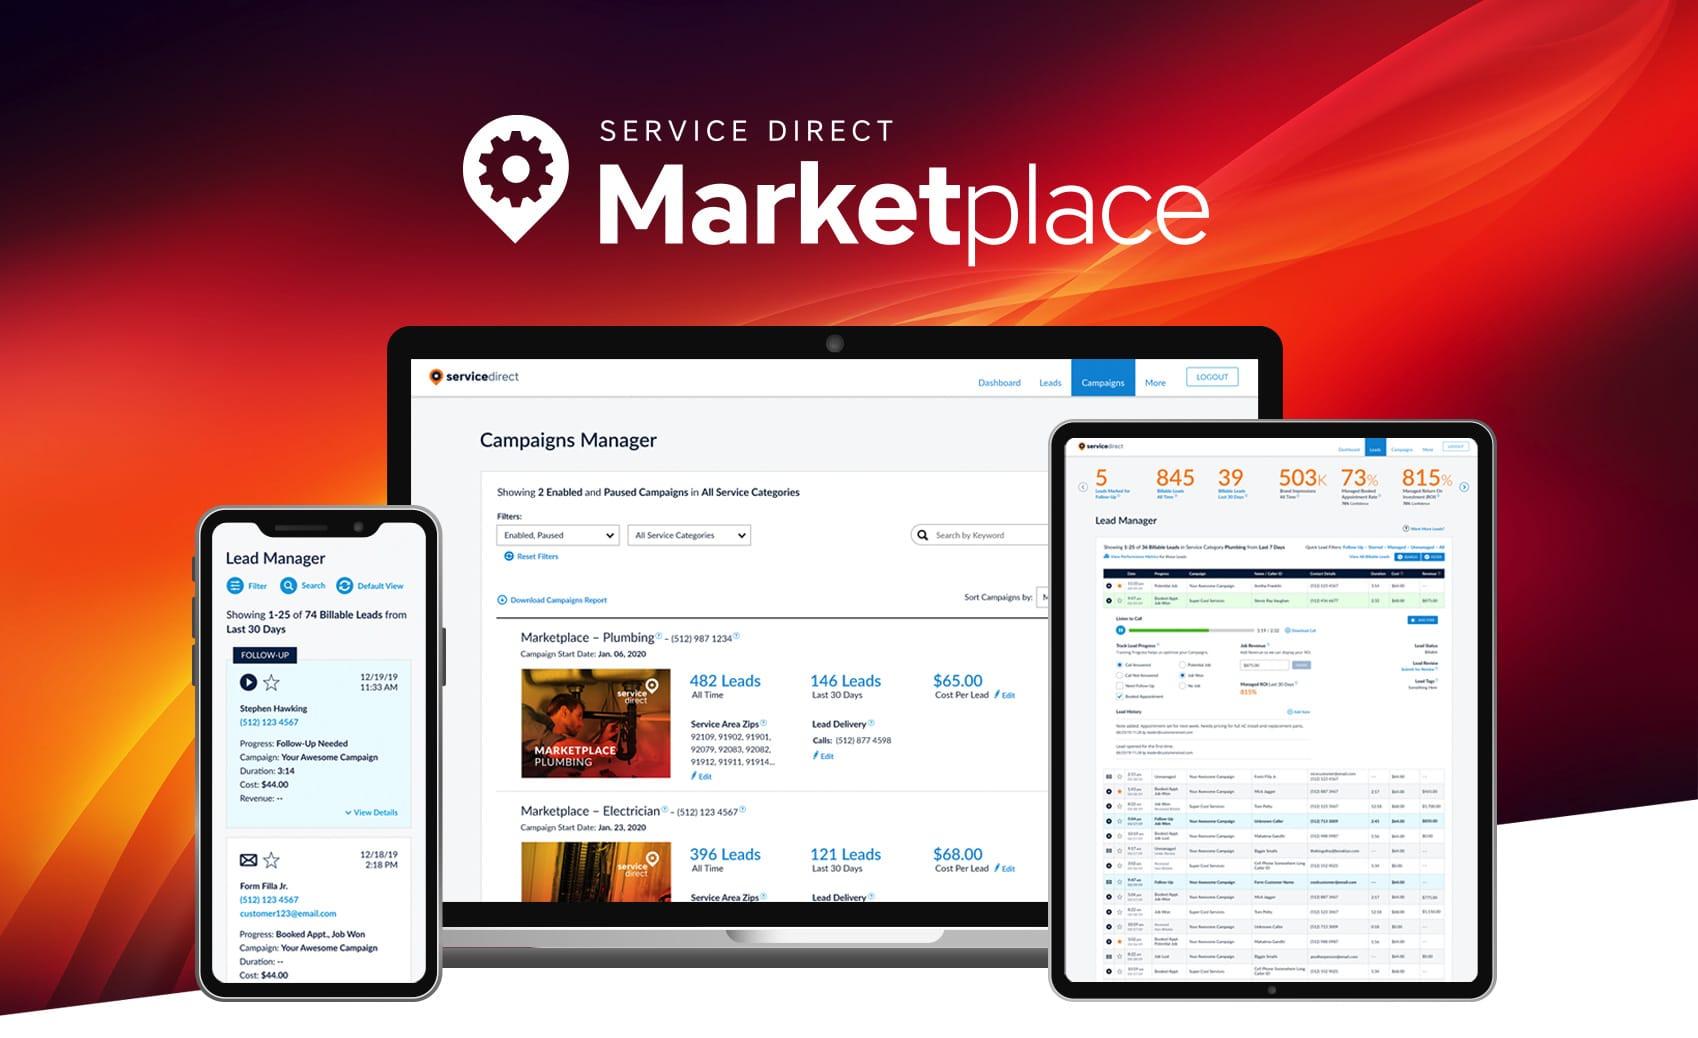 Service Direct Marketplace